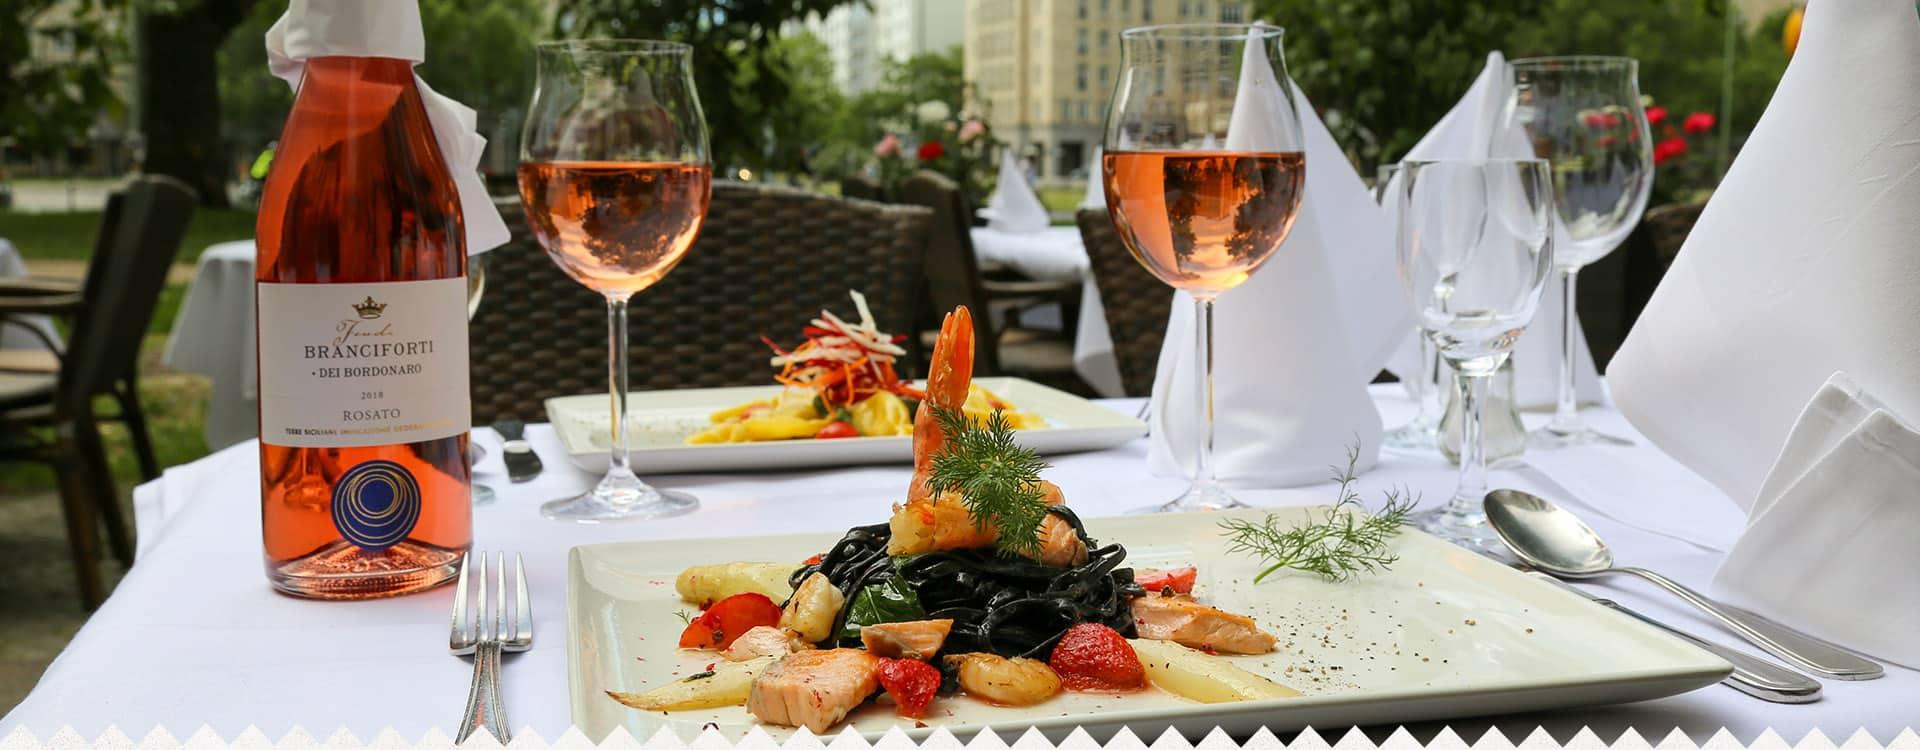 ristorante-vesuvio-berlin-slider-1920x750-6